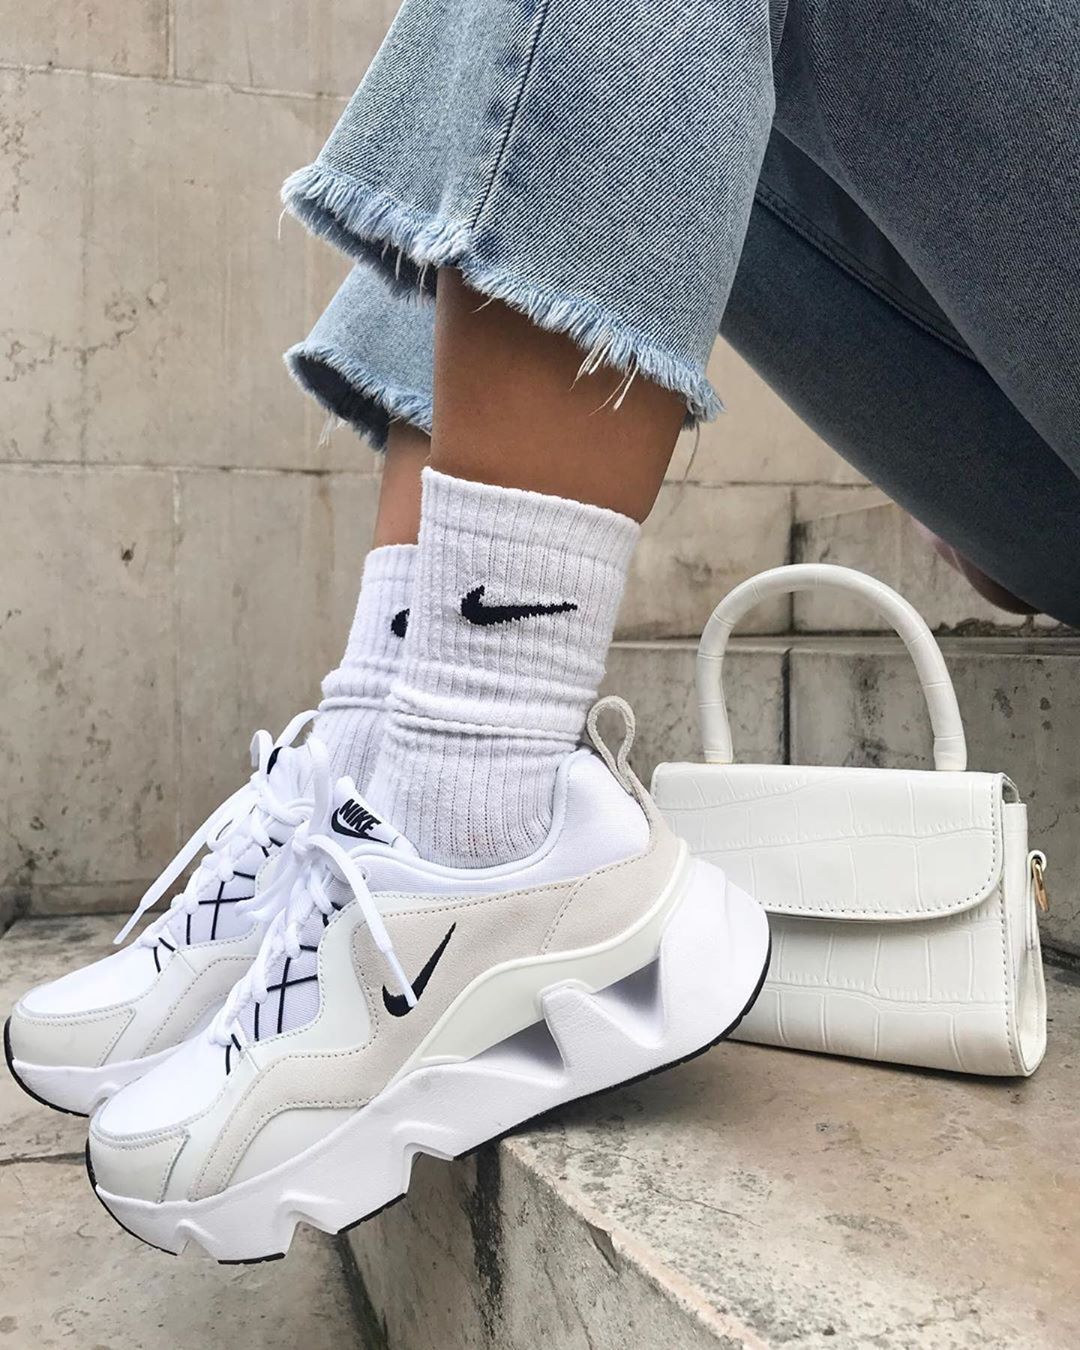 Pin by lyfeaslars on WAKE UP FLAWLESS | Nike fashion